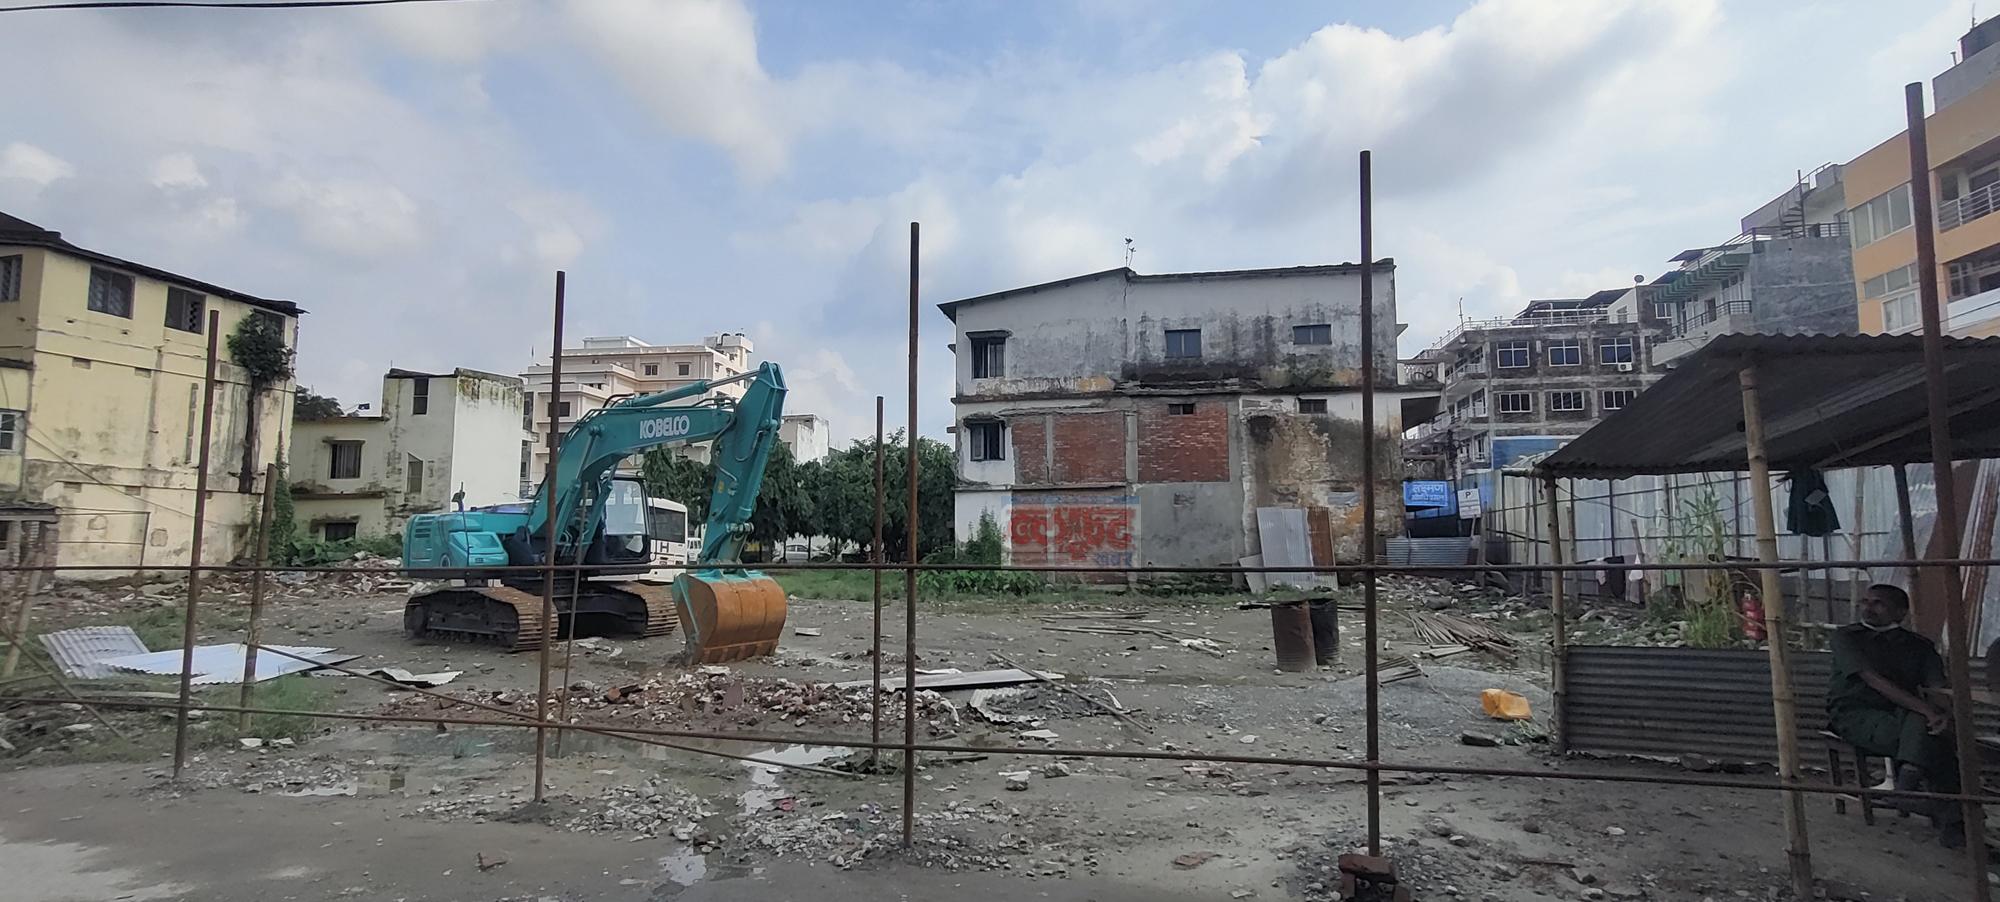 Koshi Hospital Construction Site